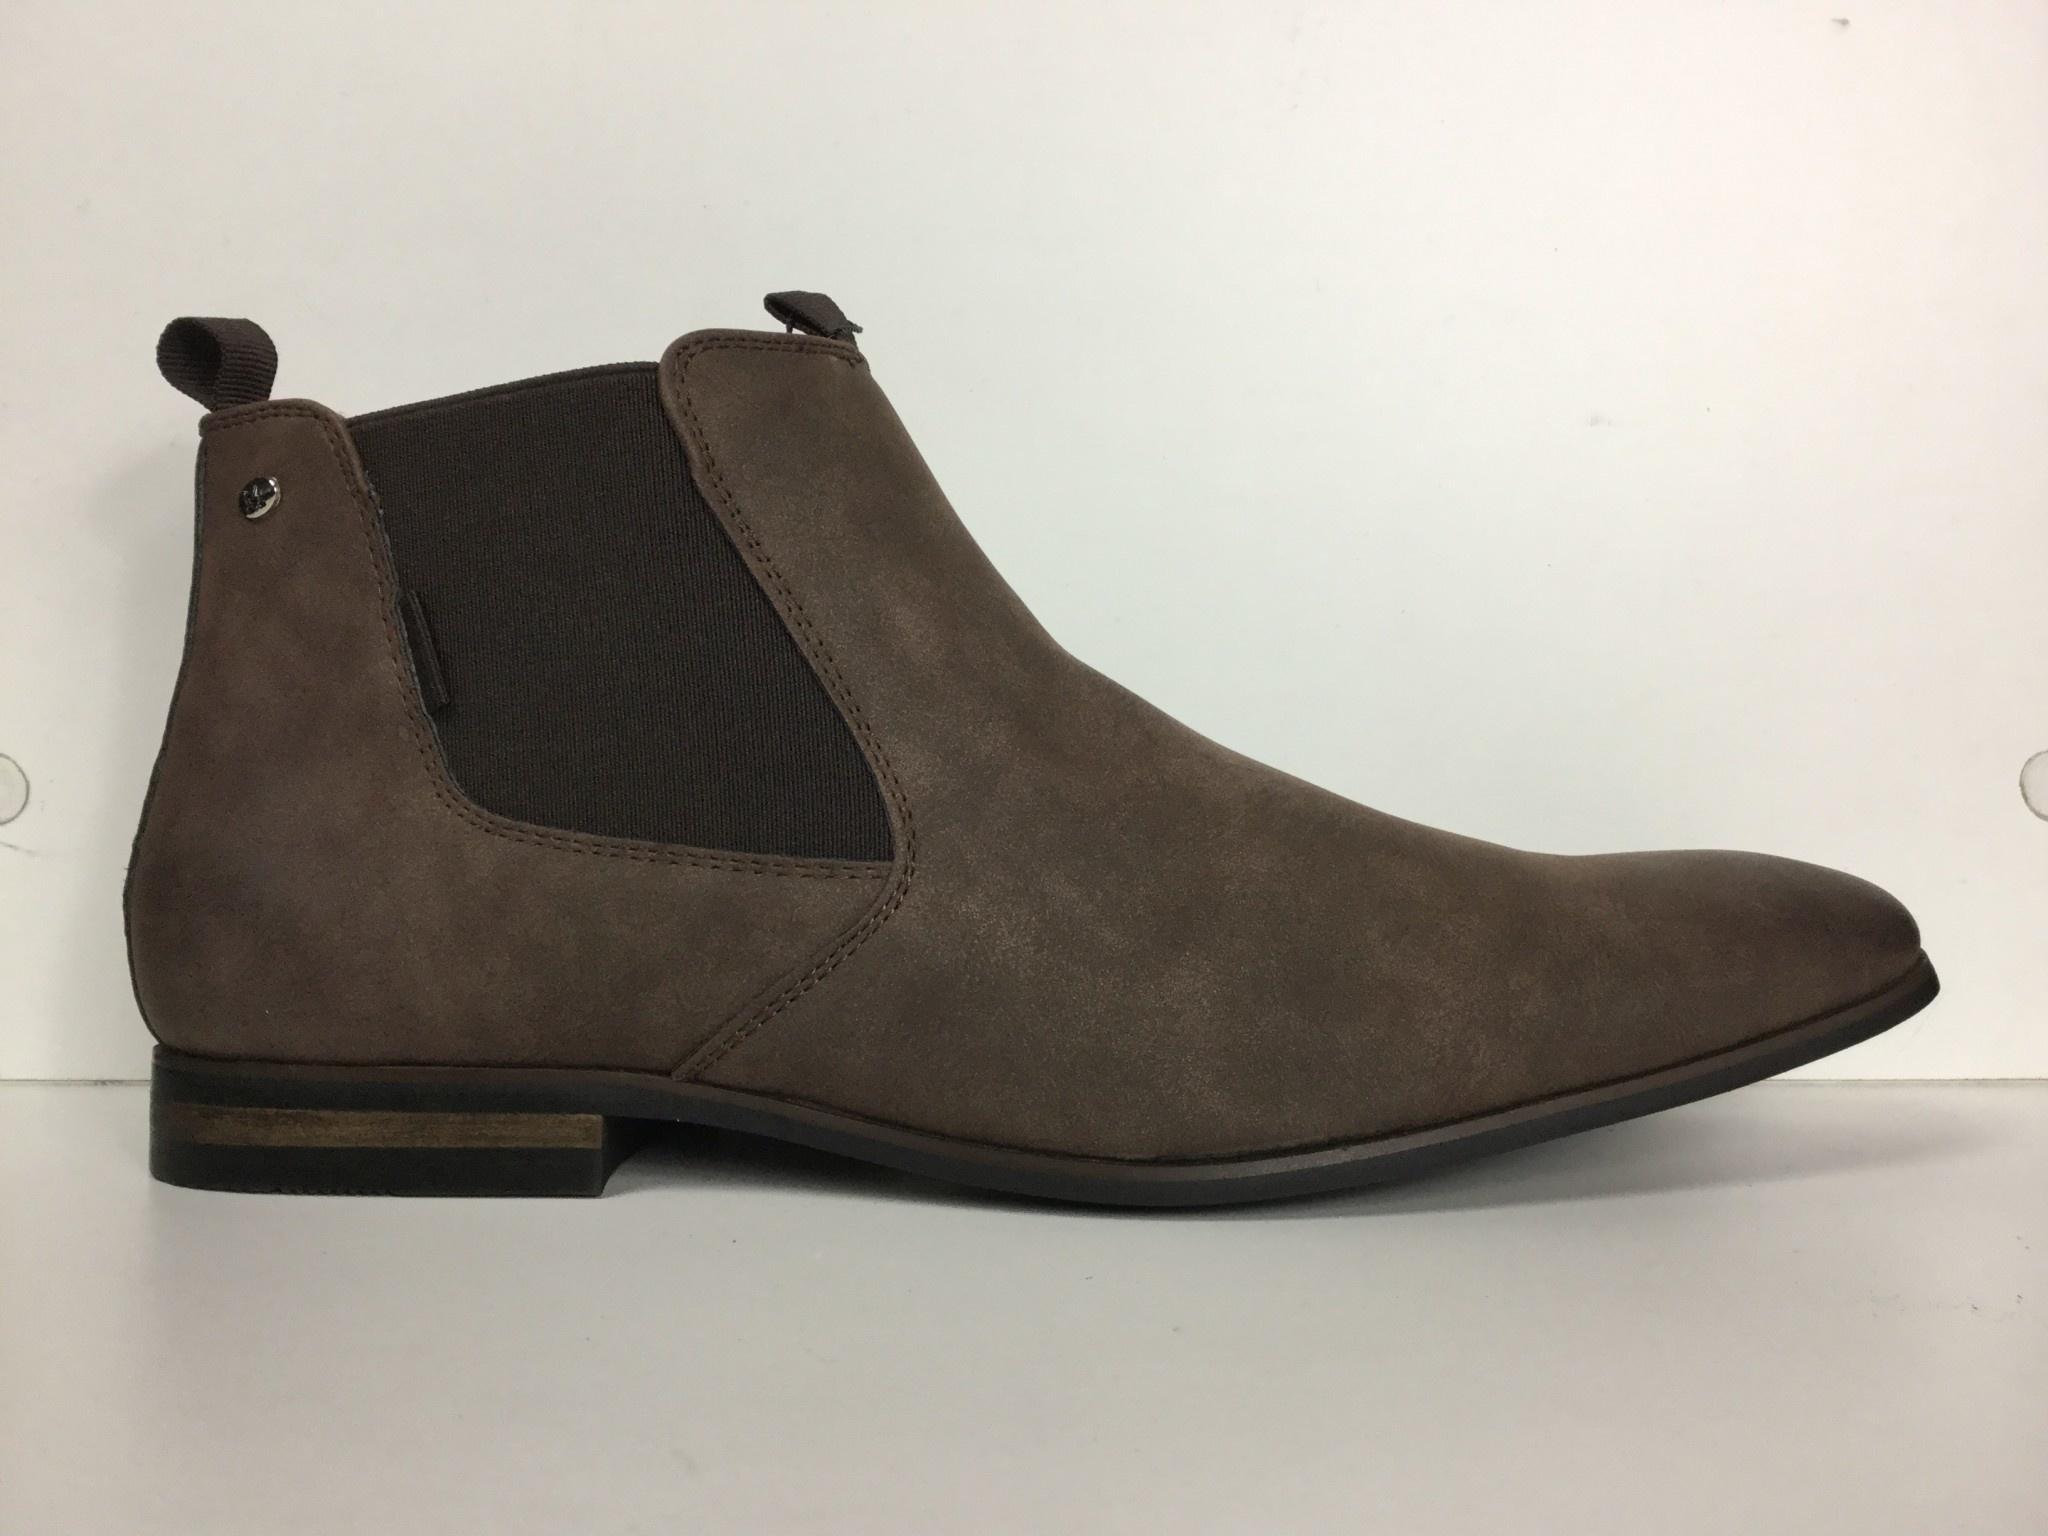 Marcozzi Rome boot